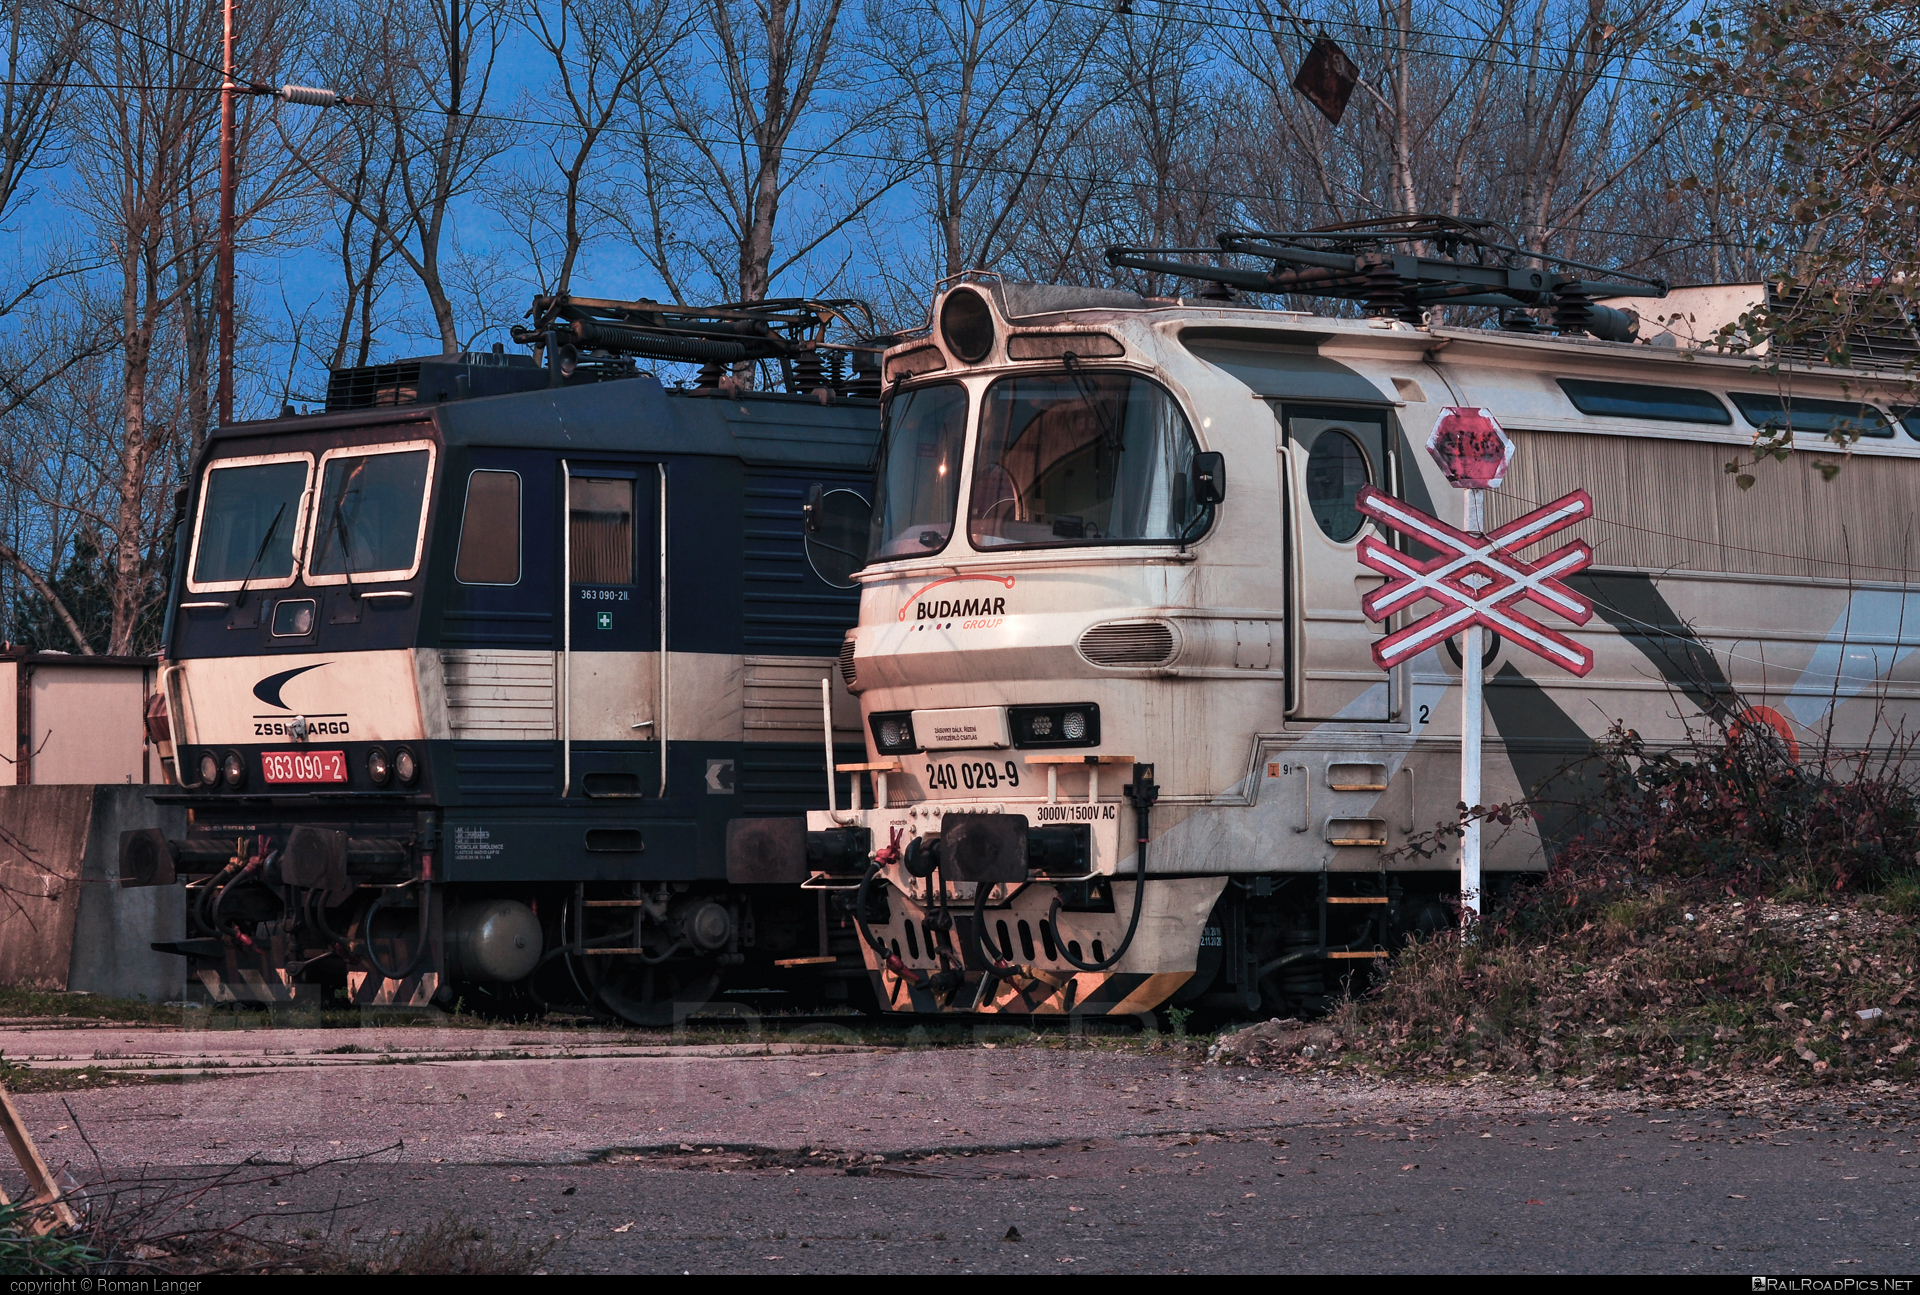 Škoda 47E - 240 029-9 operated by LOKORAIL, a.s. #BulkTransshipmentSlovakia #bts #budamargroup #laminatka #locomotive240 #lokorail #lrl #skoda #skoda47e